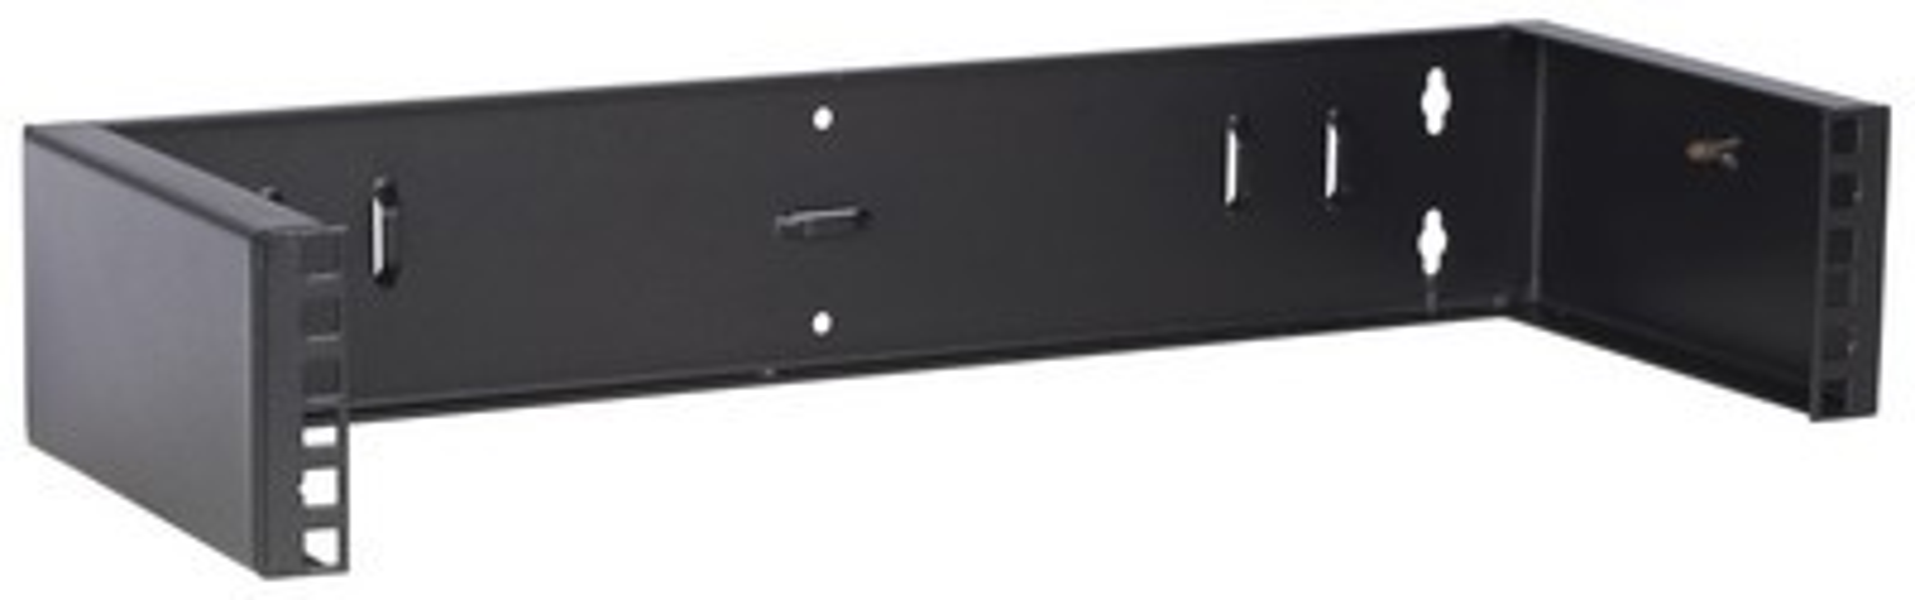 Afbeelding van 2U wall mount bracket - 180mm deep